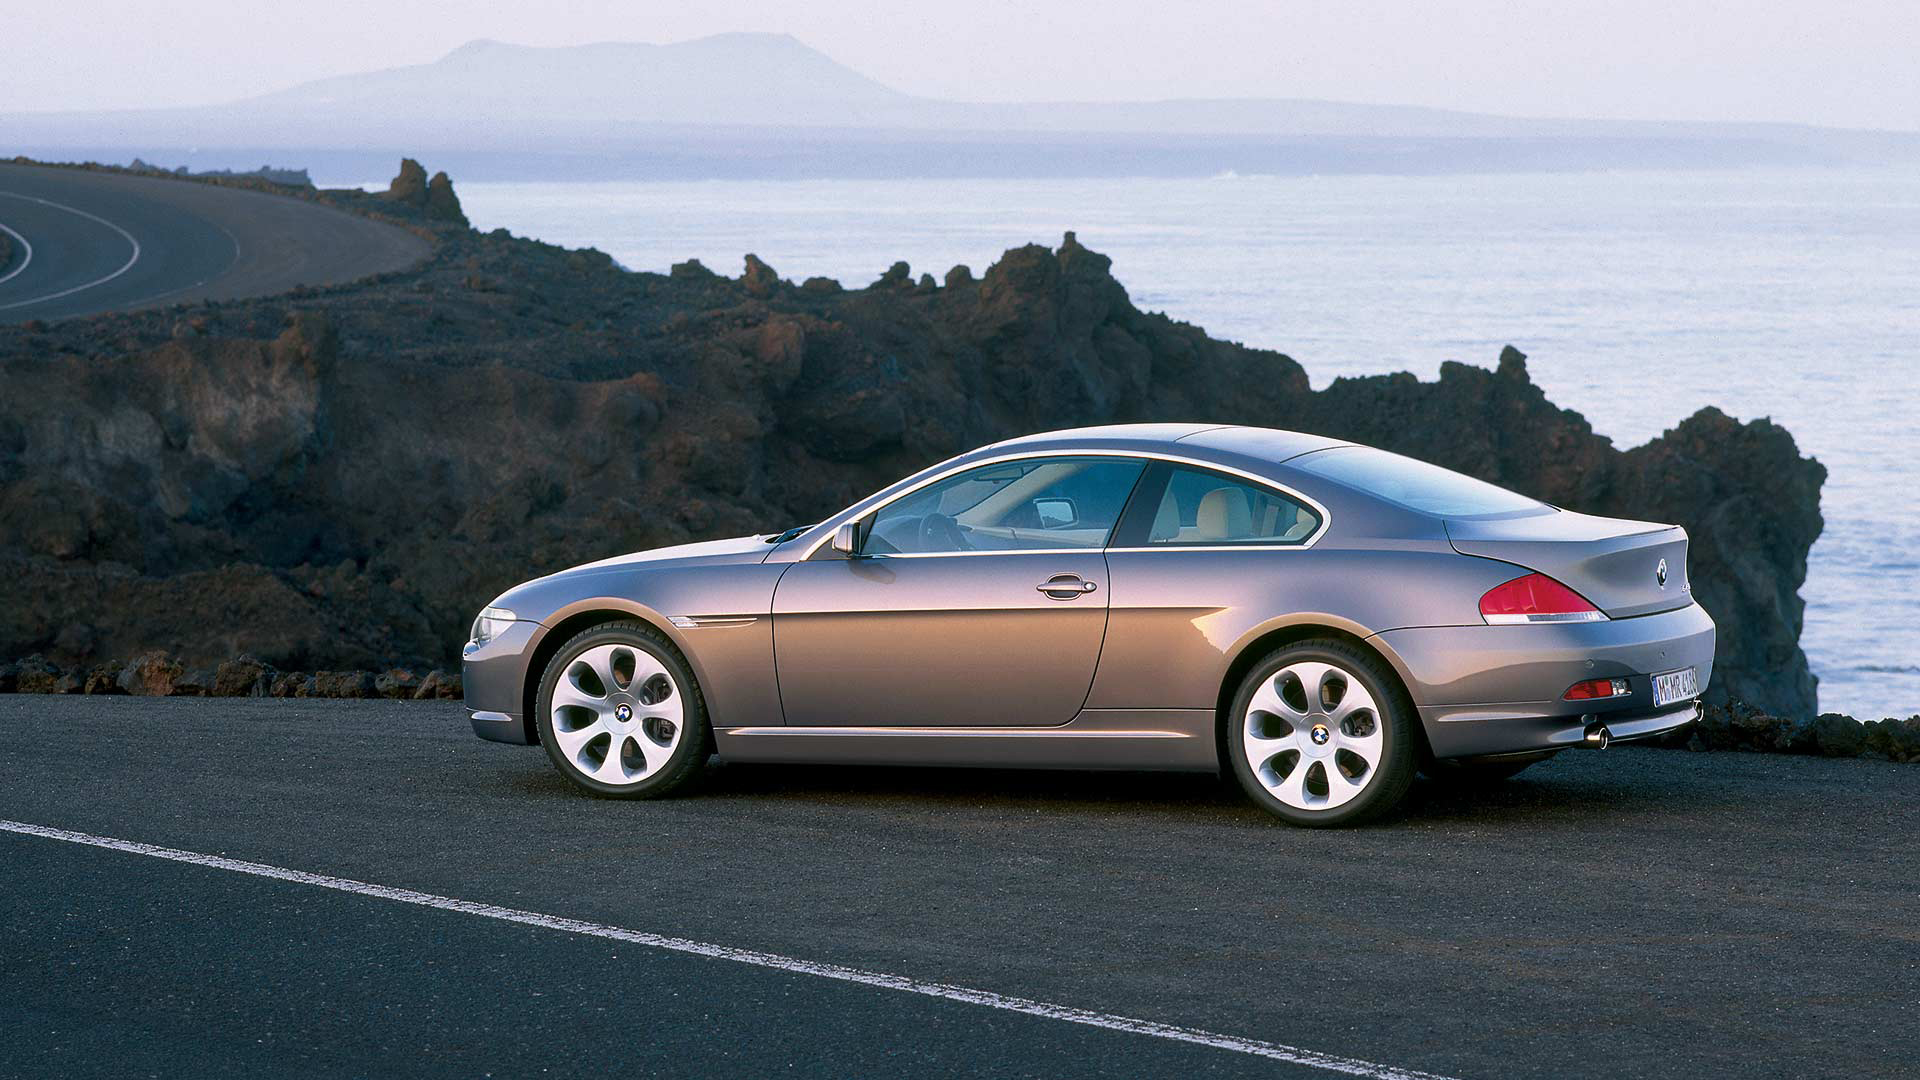 2003 E63 BMW 6 Series